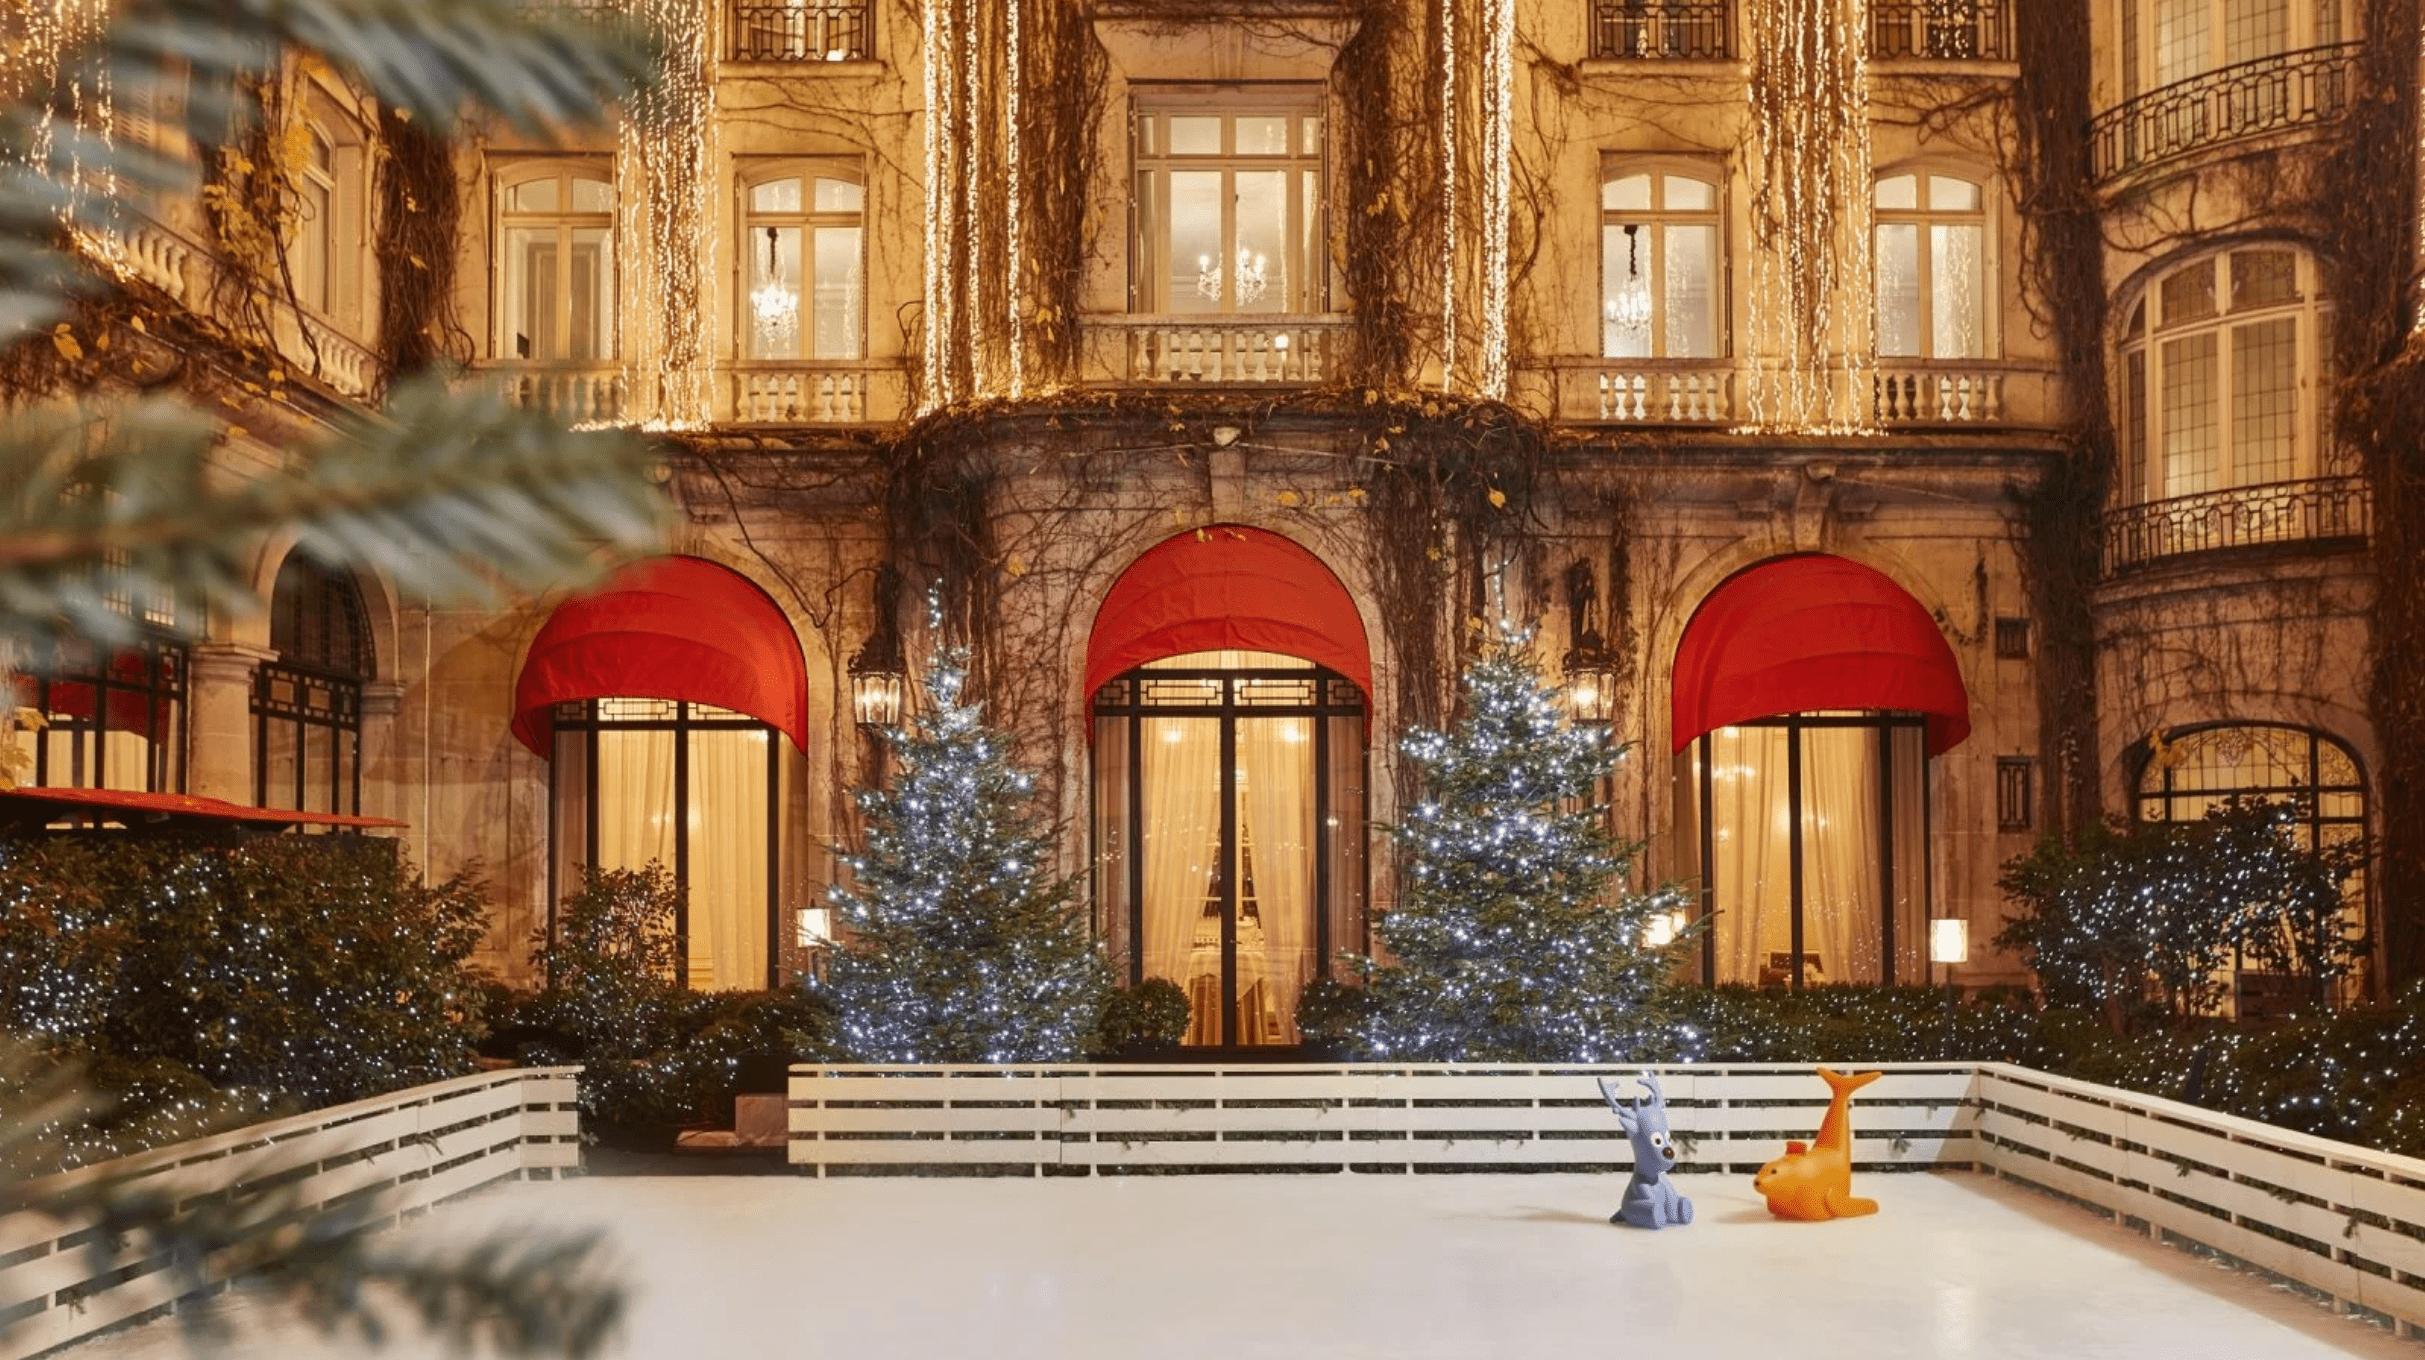 Hotel Plaza Athénée at Christmas